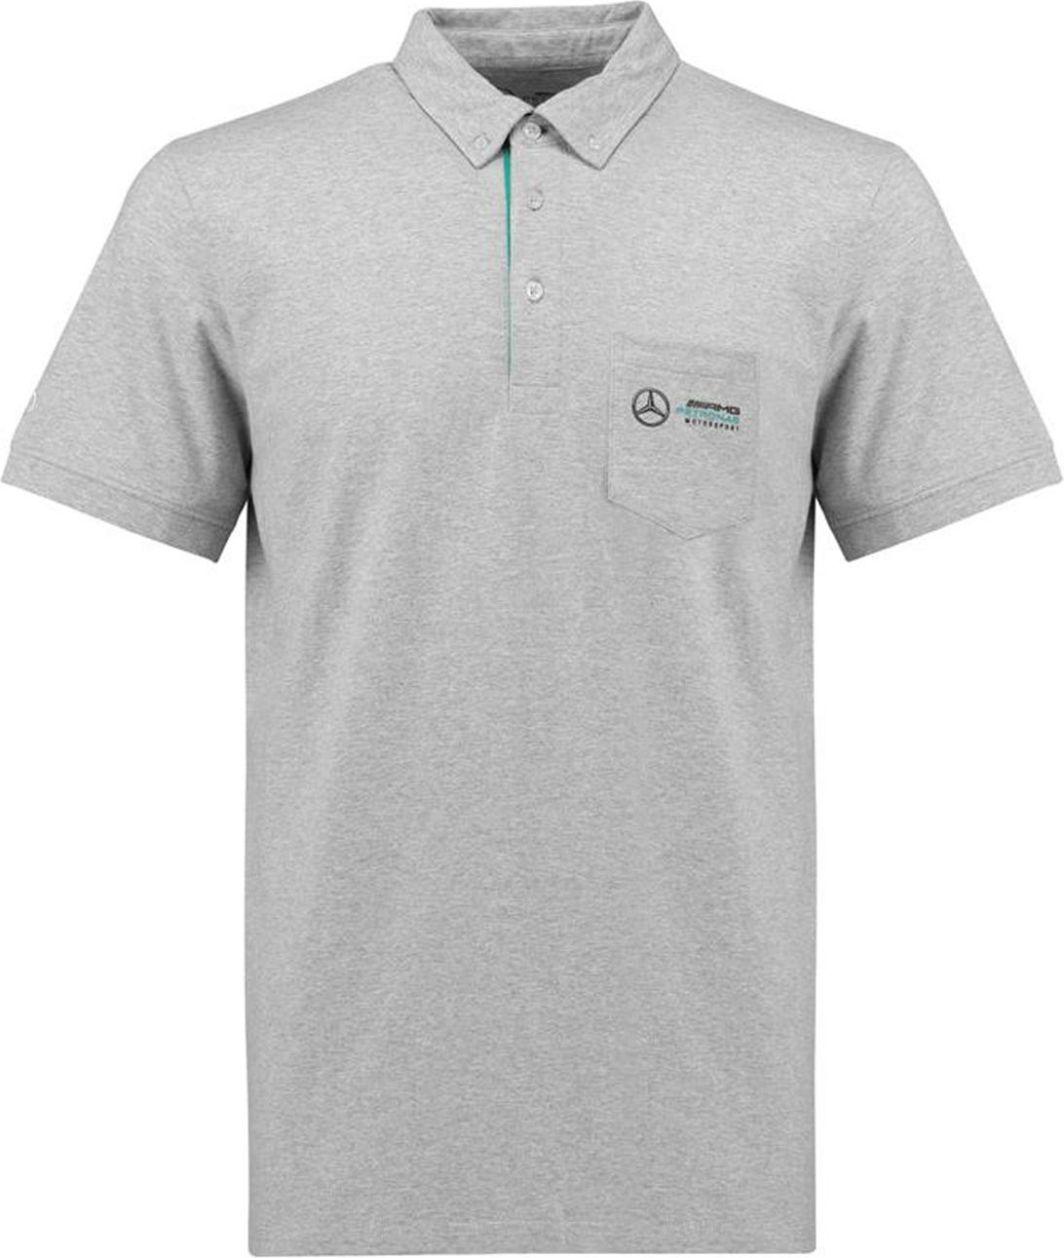 4510ef8d95cdb Mercedes AMG Petronas F1 Team Koszulka męska Mens Marl Classic Polo Shirt  szara r. XXL w Sklep-presto.pl